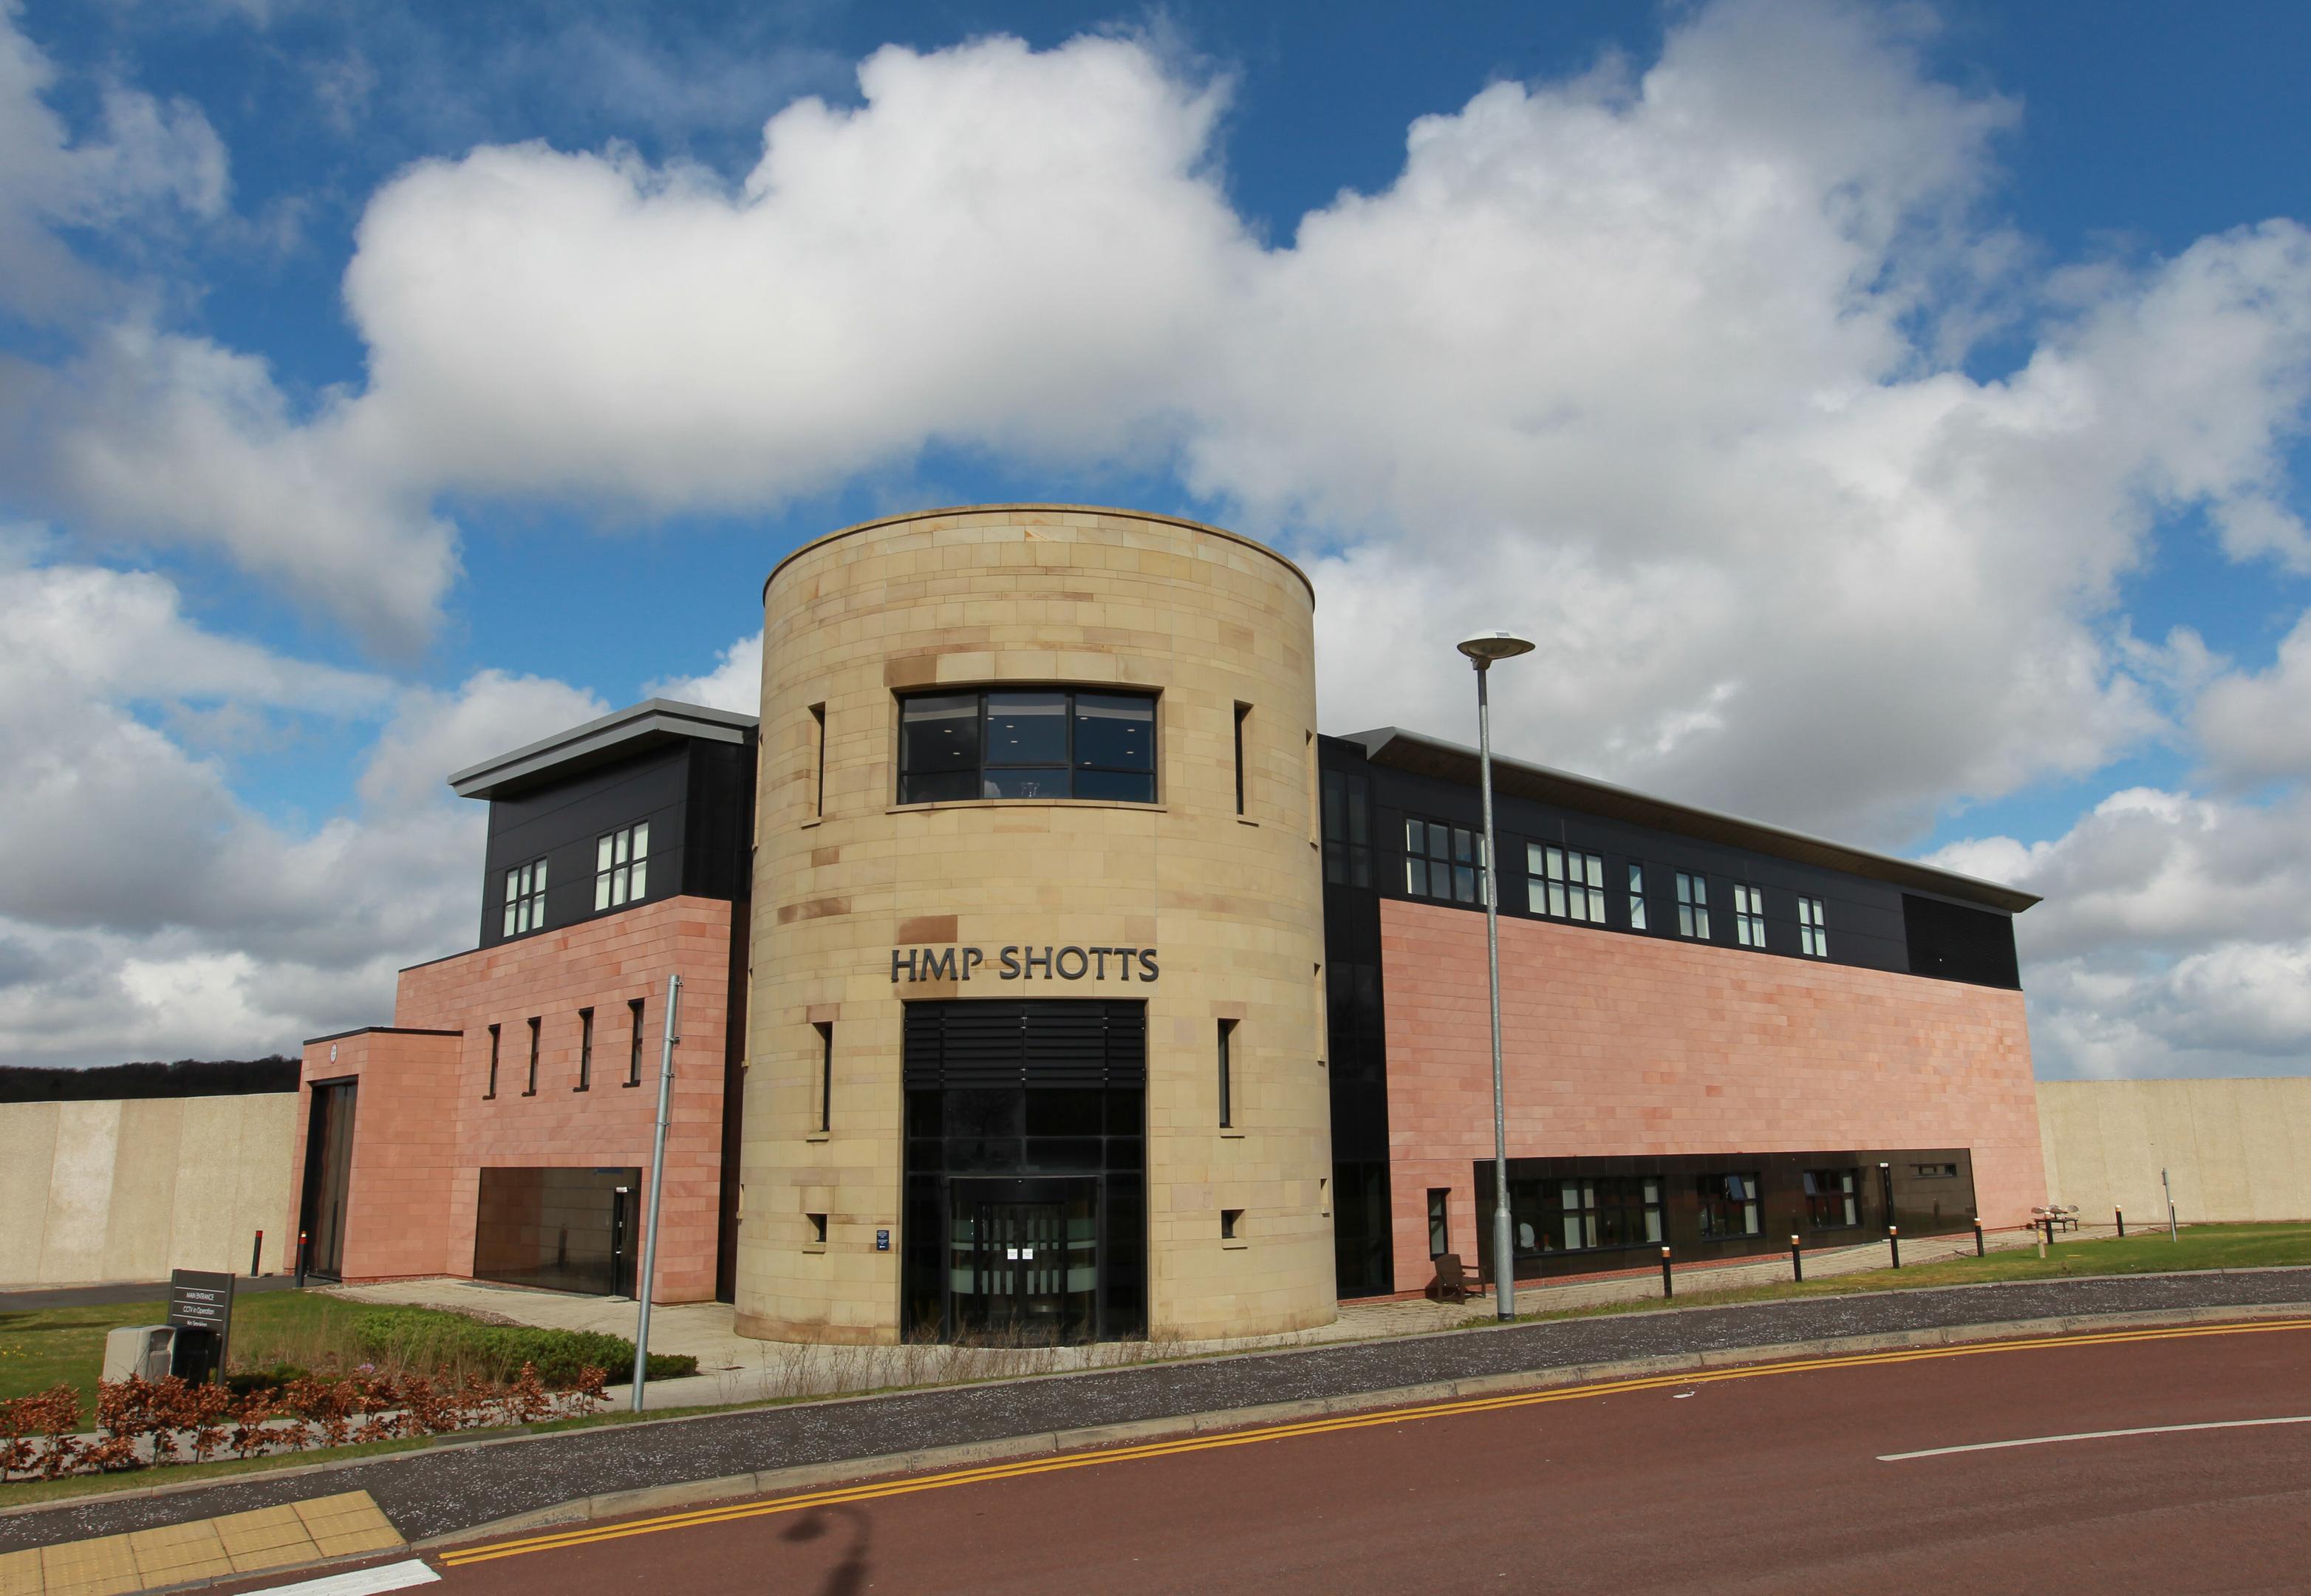 HMP Shotts Prison. (Andrew Cawley)